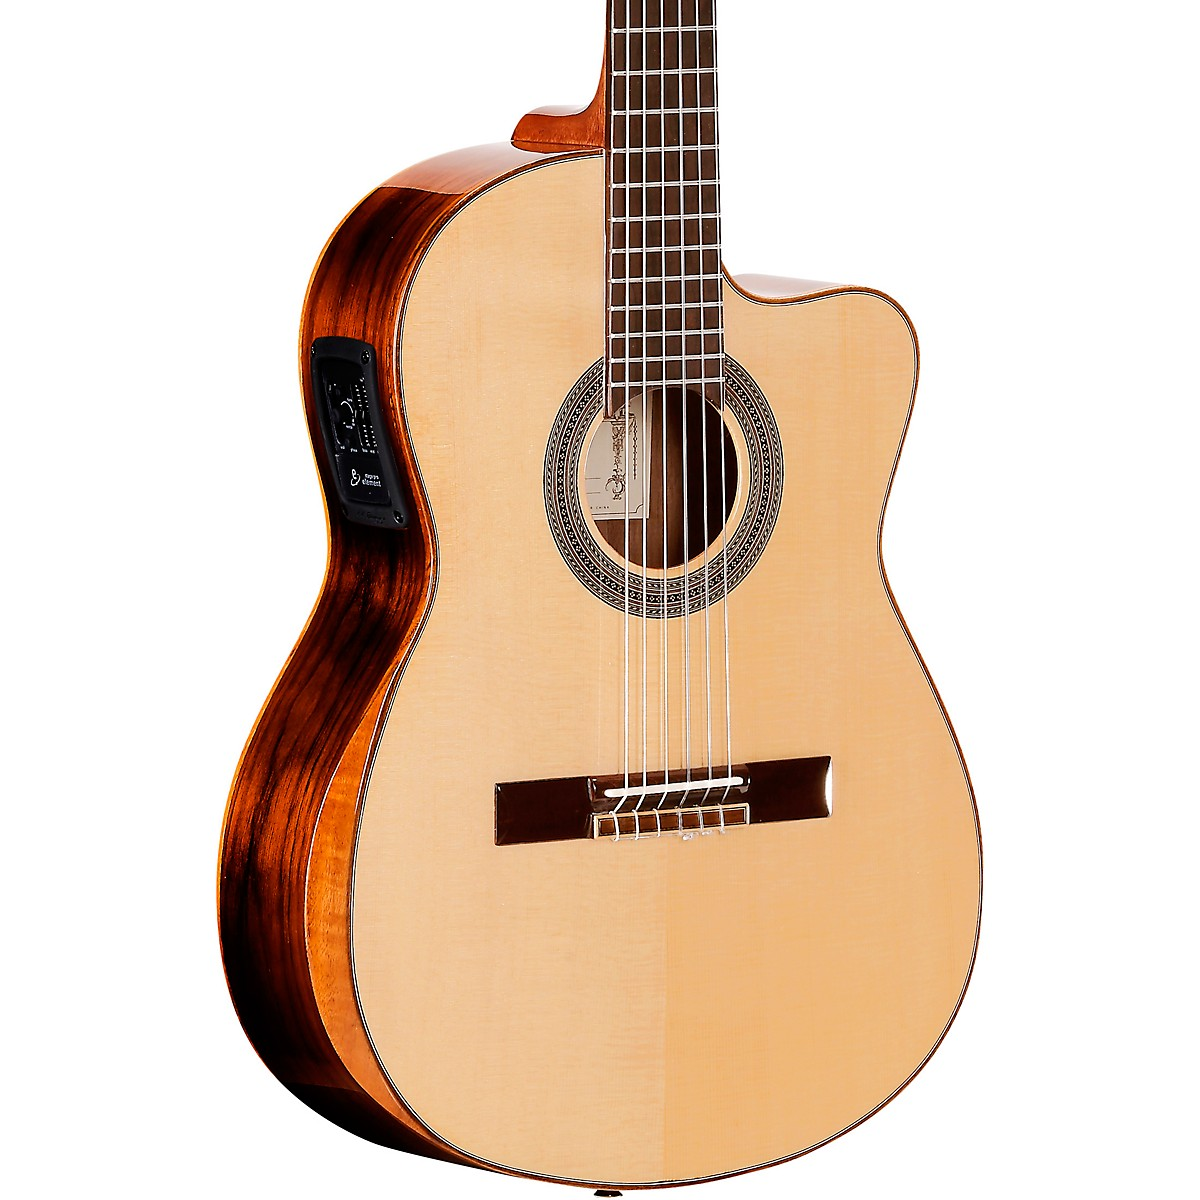 Alvarez CC7HCEAR Cadiz Classical Hybrid Acoustic-Electric Guitar